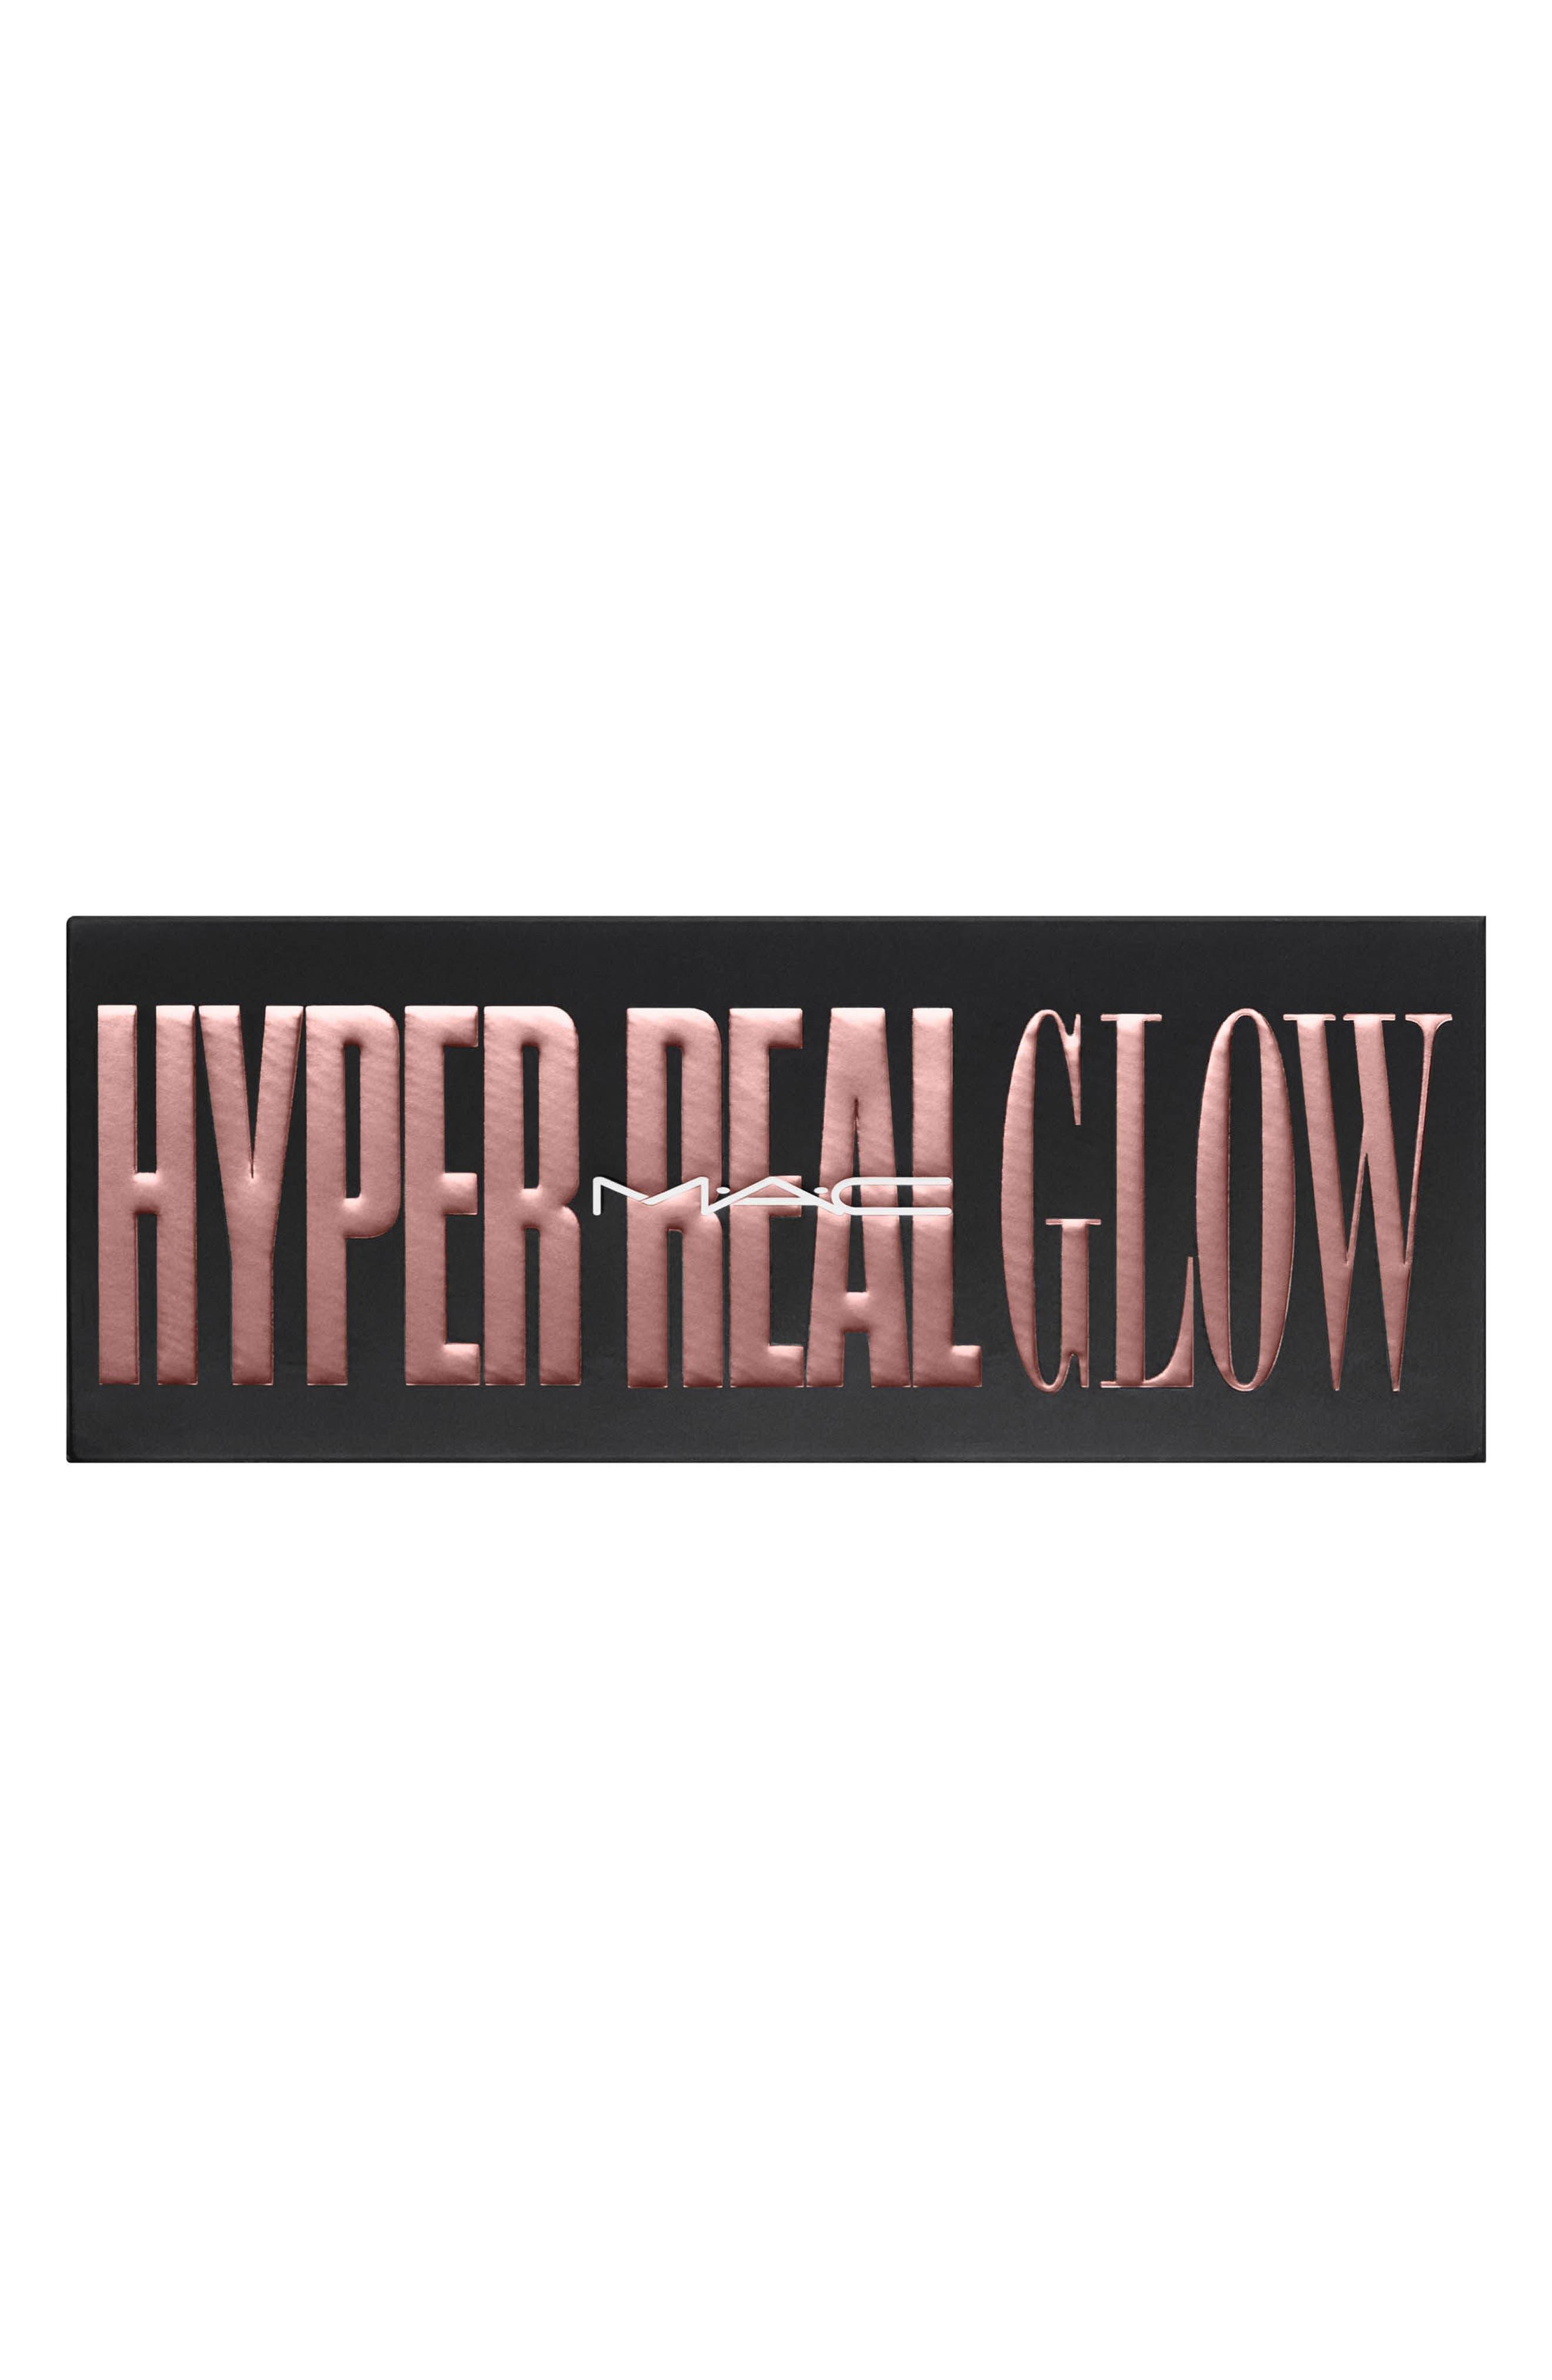 MAC Hyper Real Glow Palette,                             Alternate thumbnail 5, color,                             Flash Awe